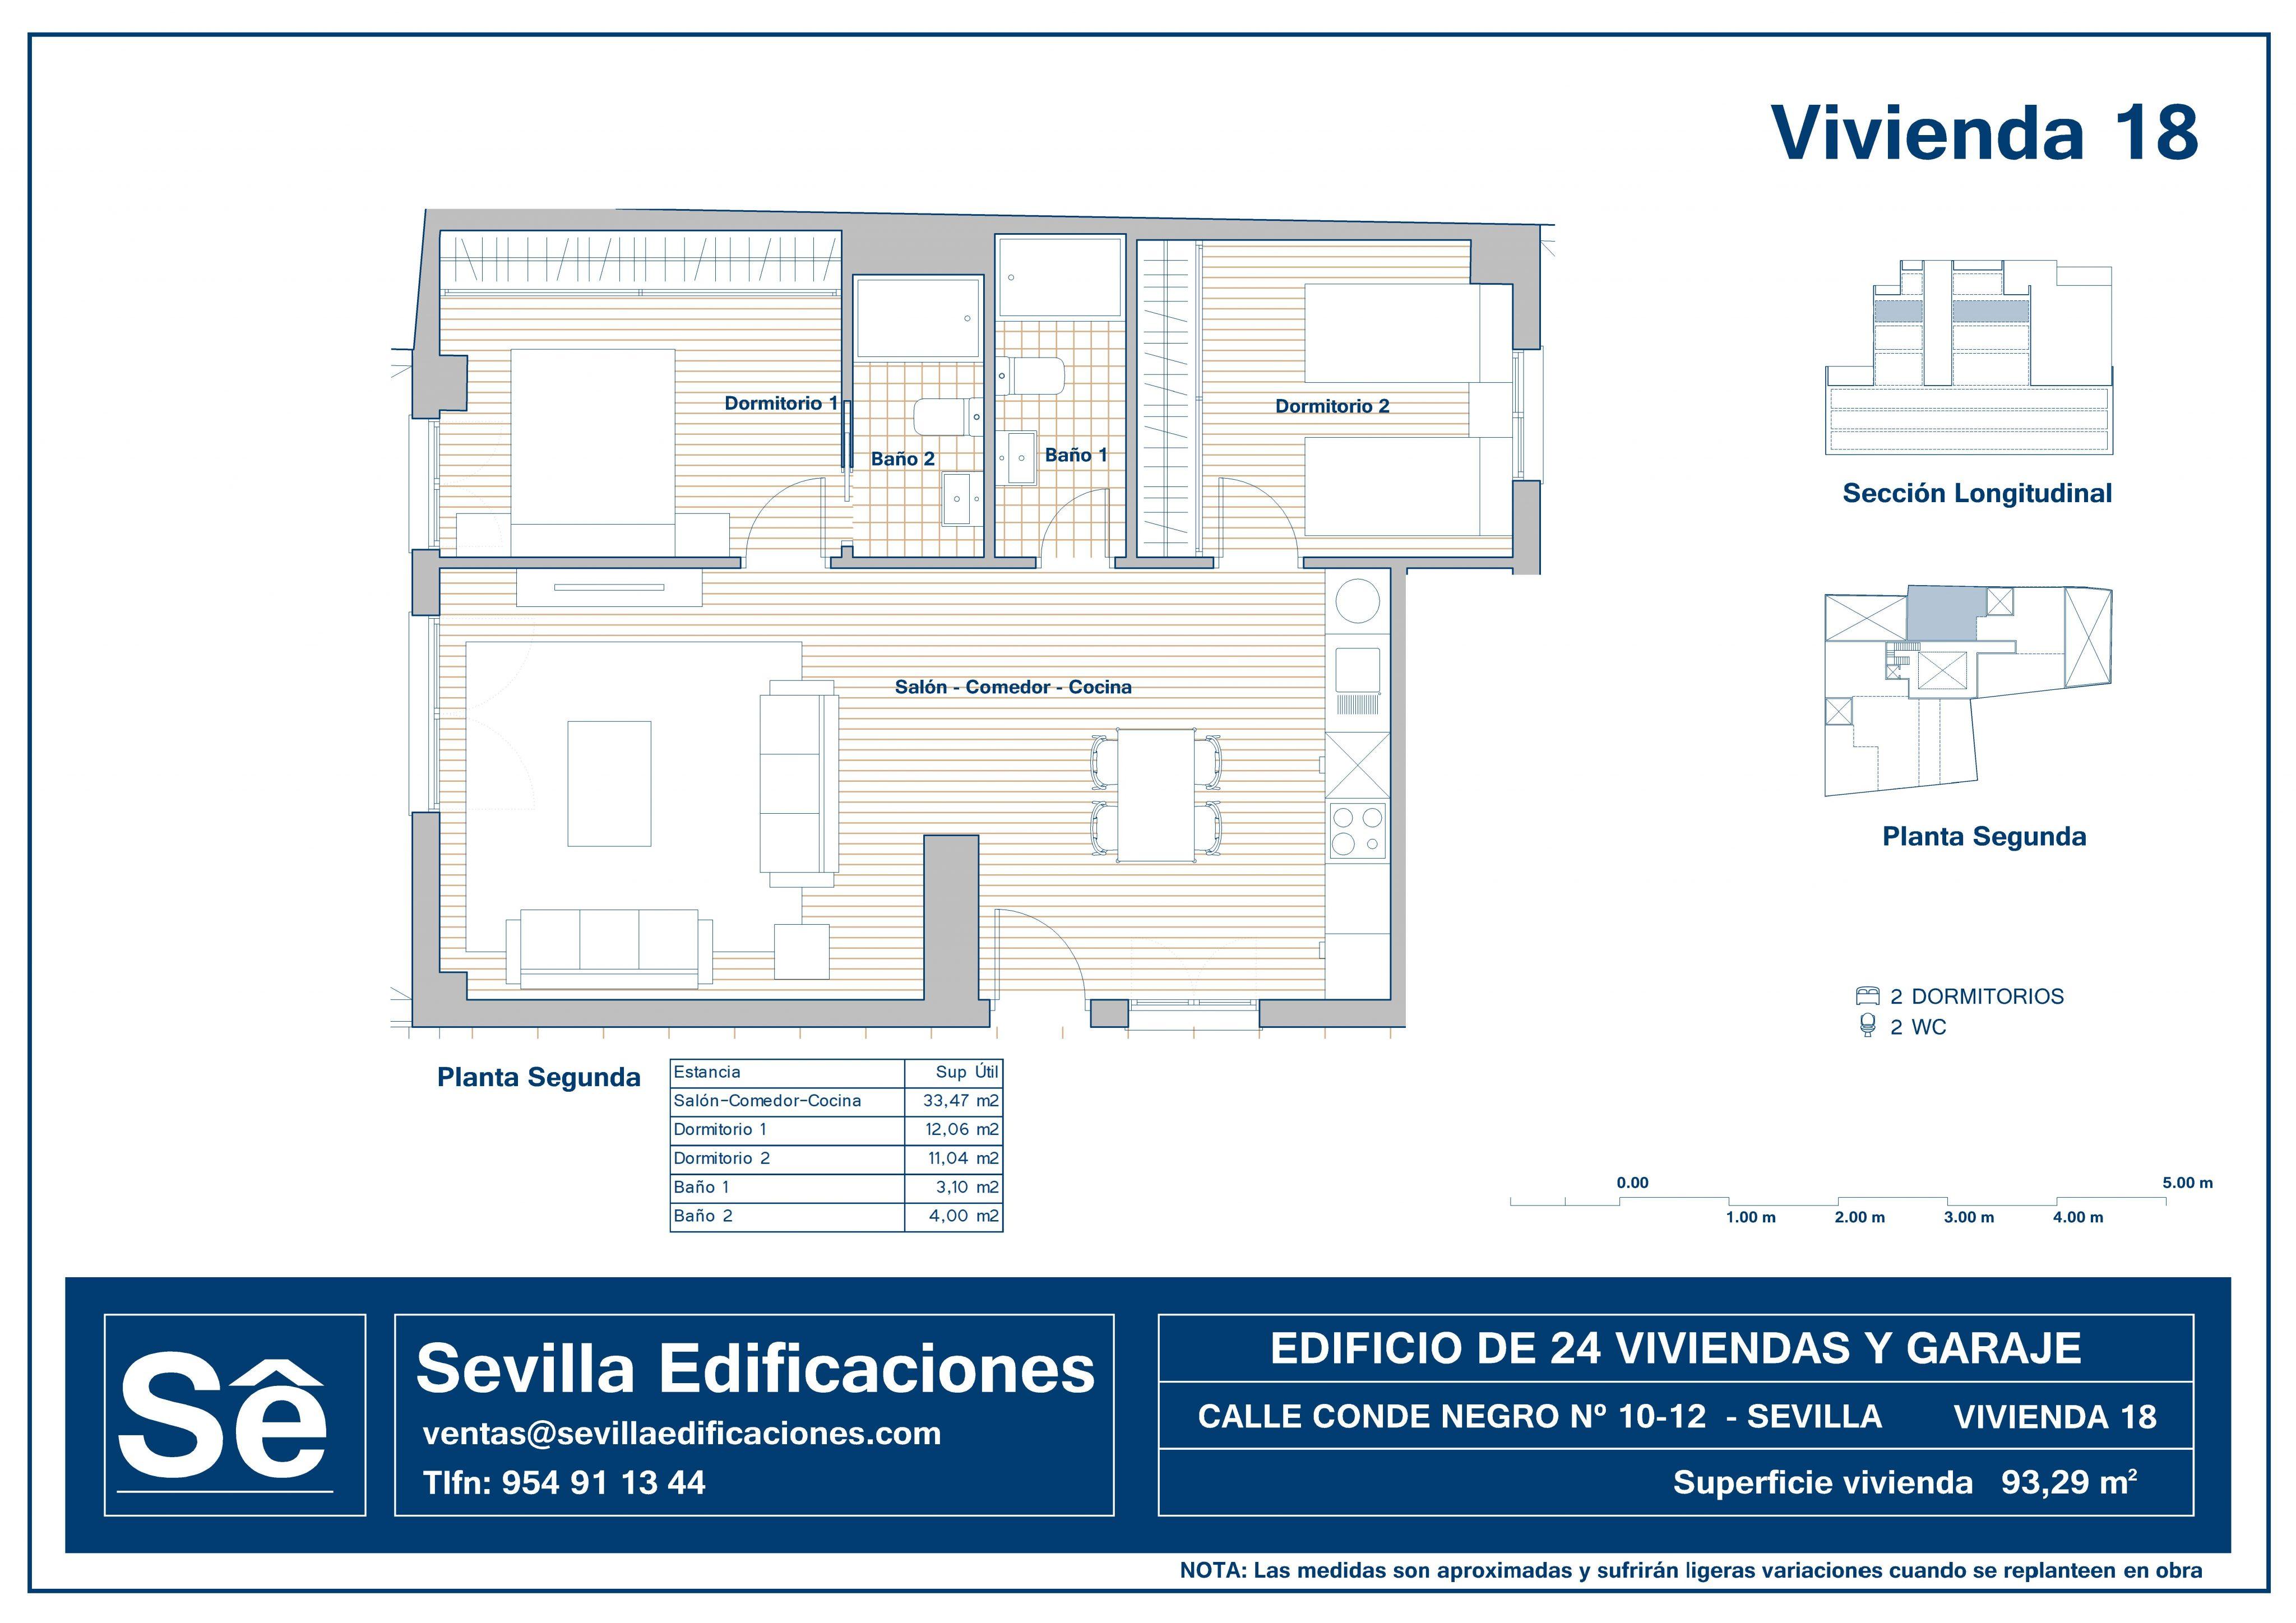 CONDENEGRO_VIVIENDA_18